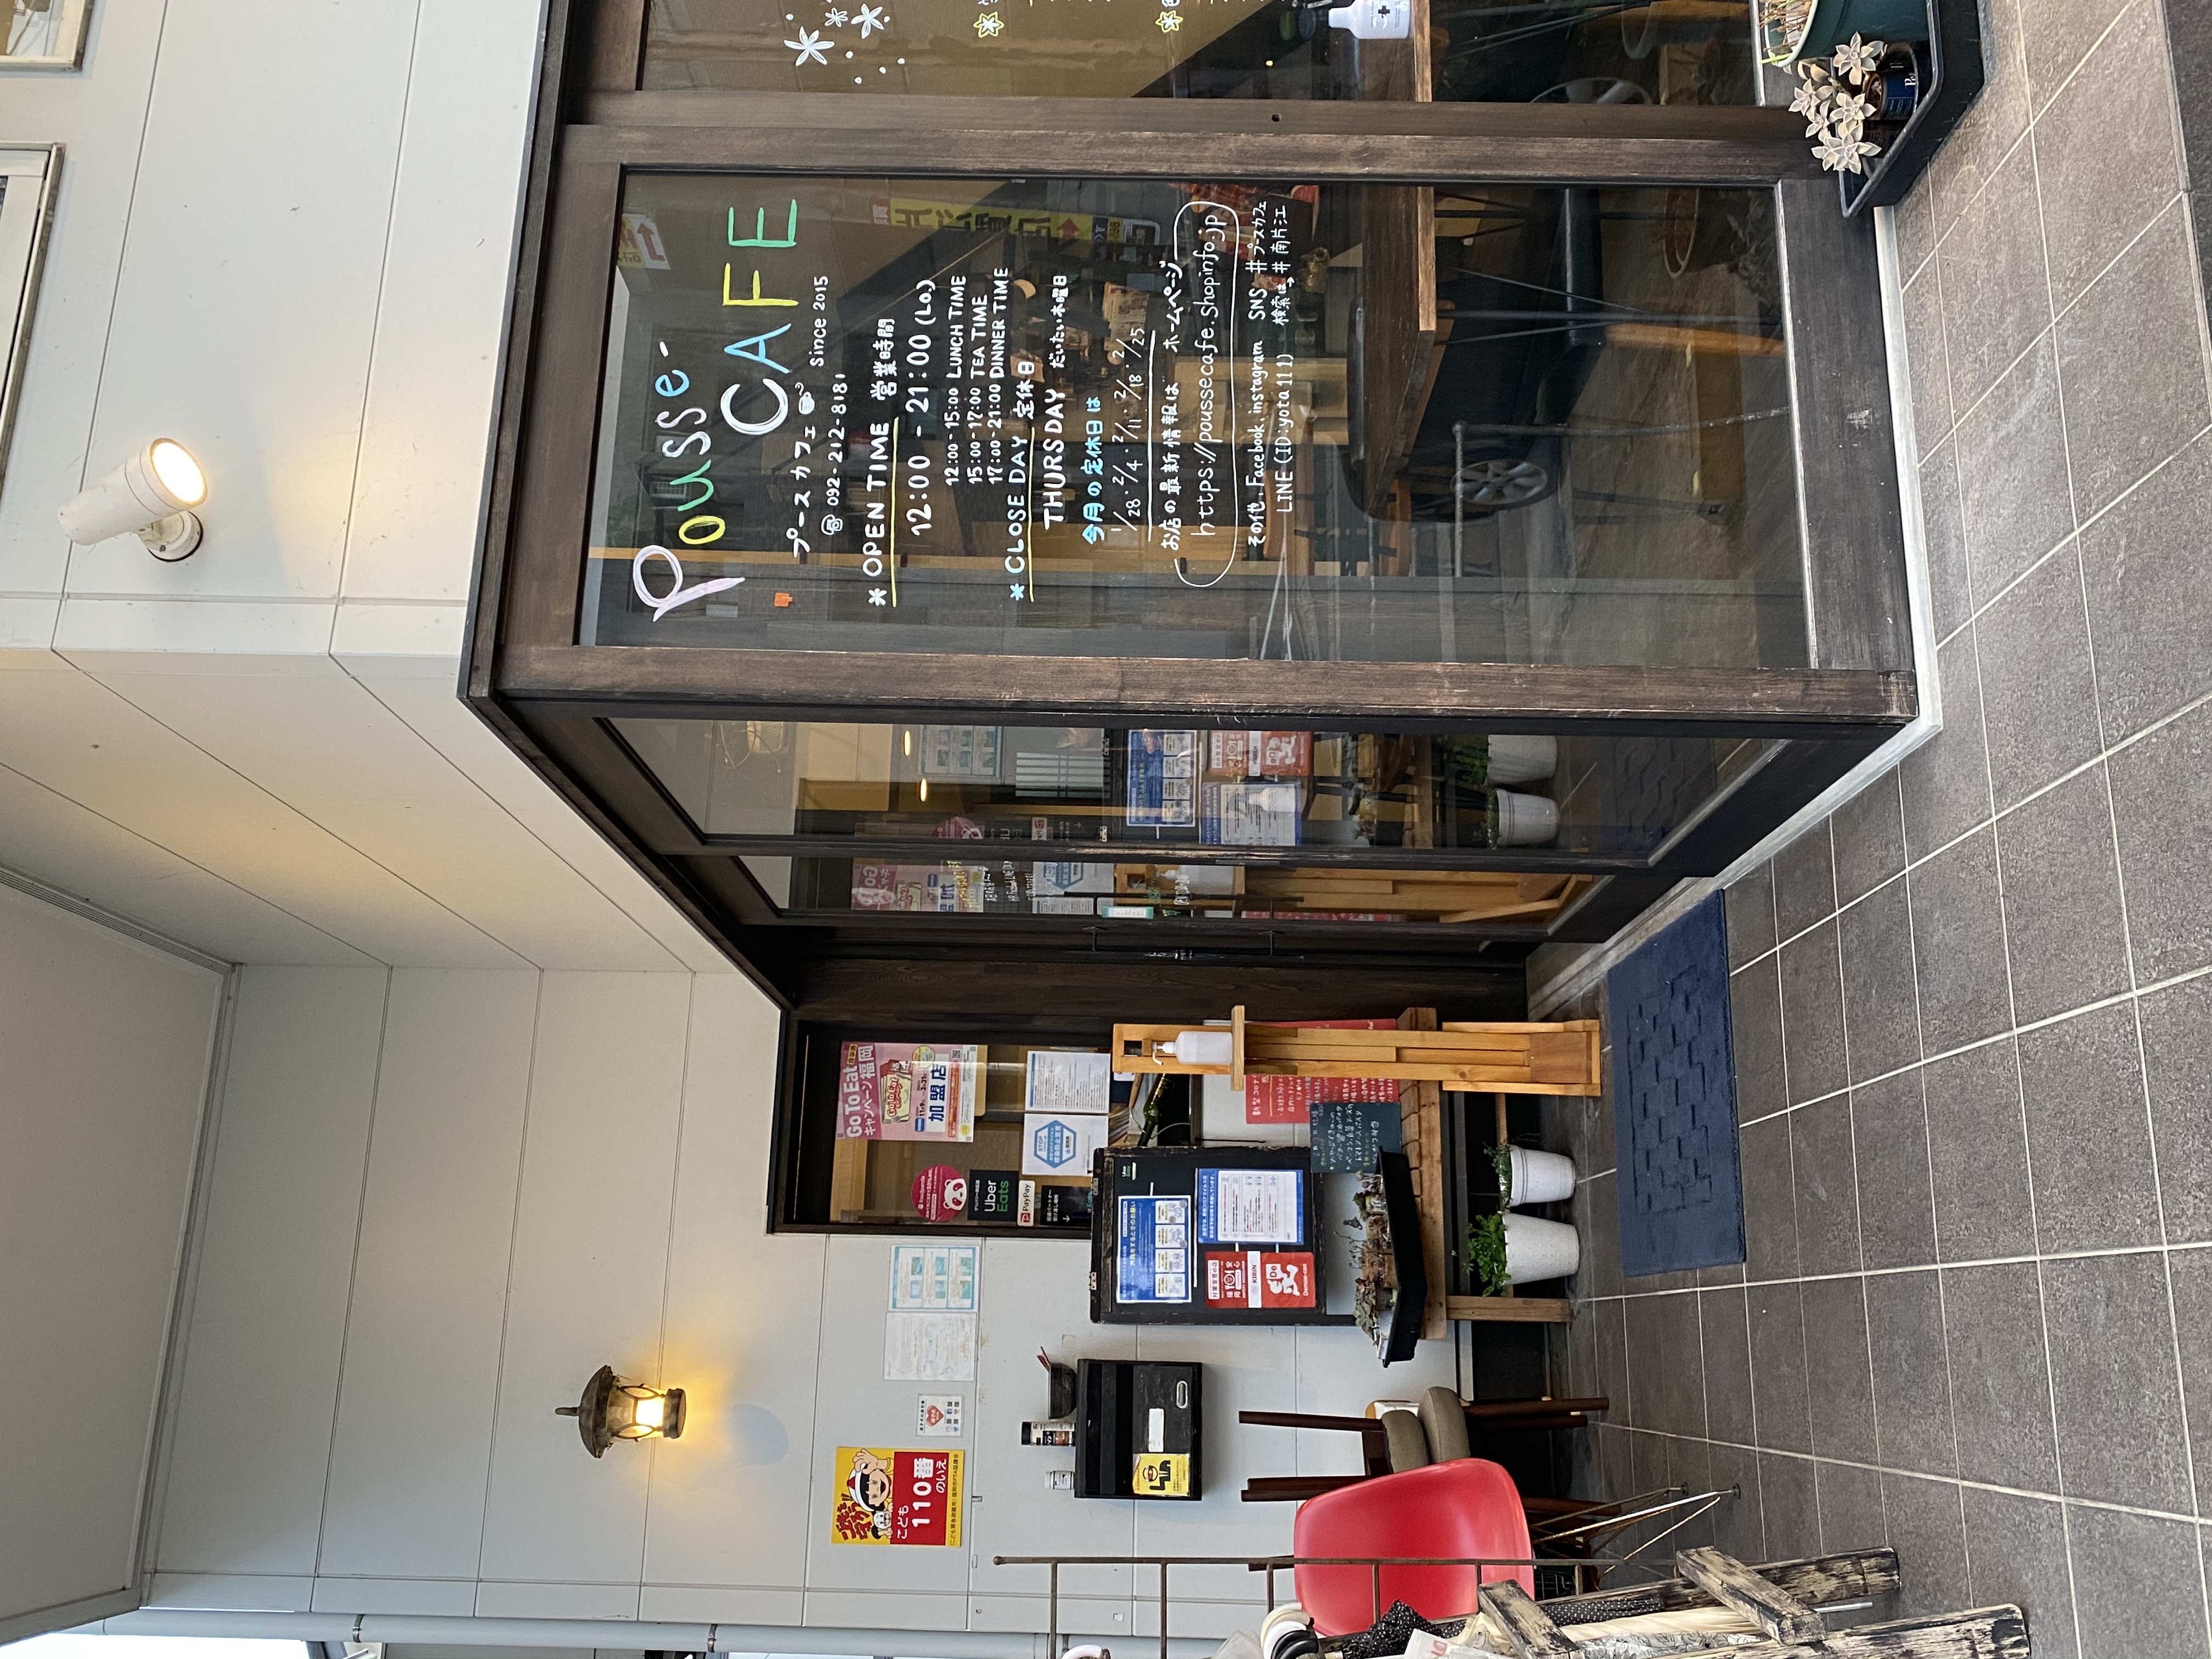 pousse-cafe(プースカフェ)